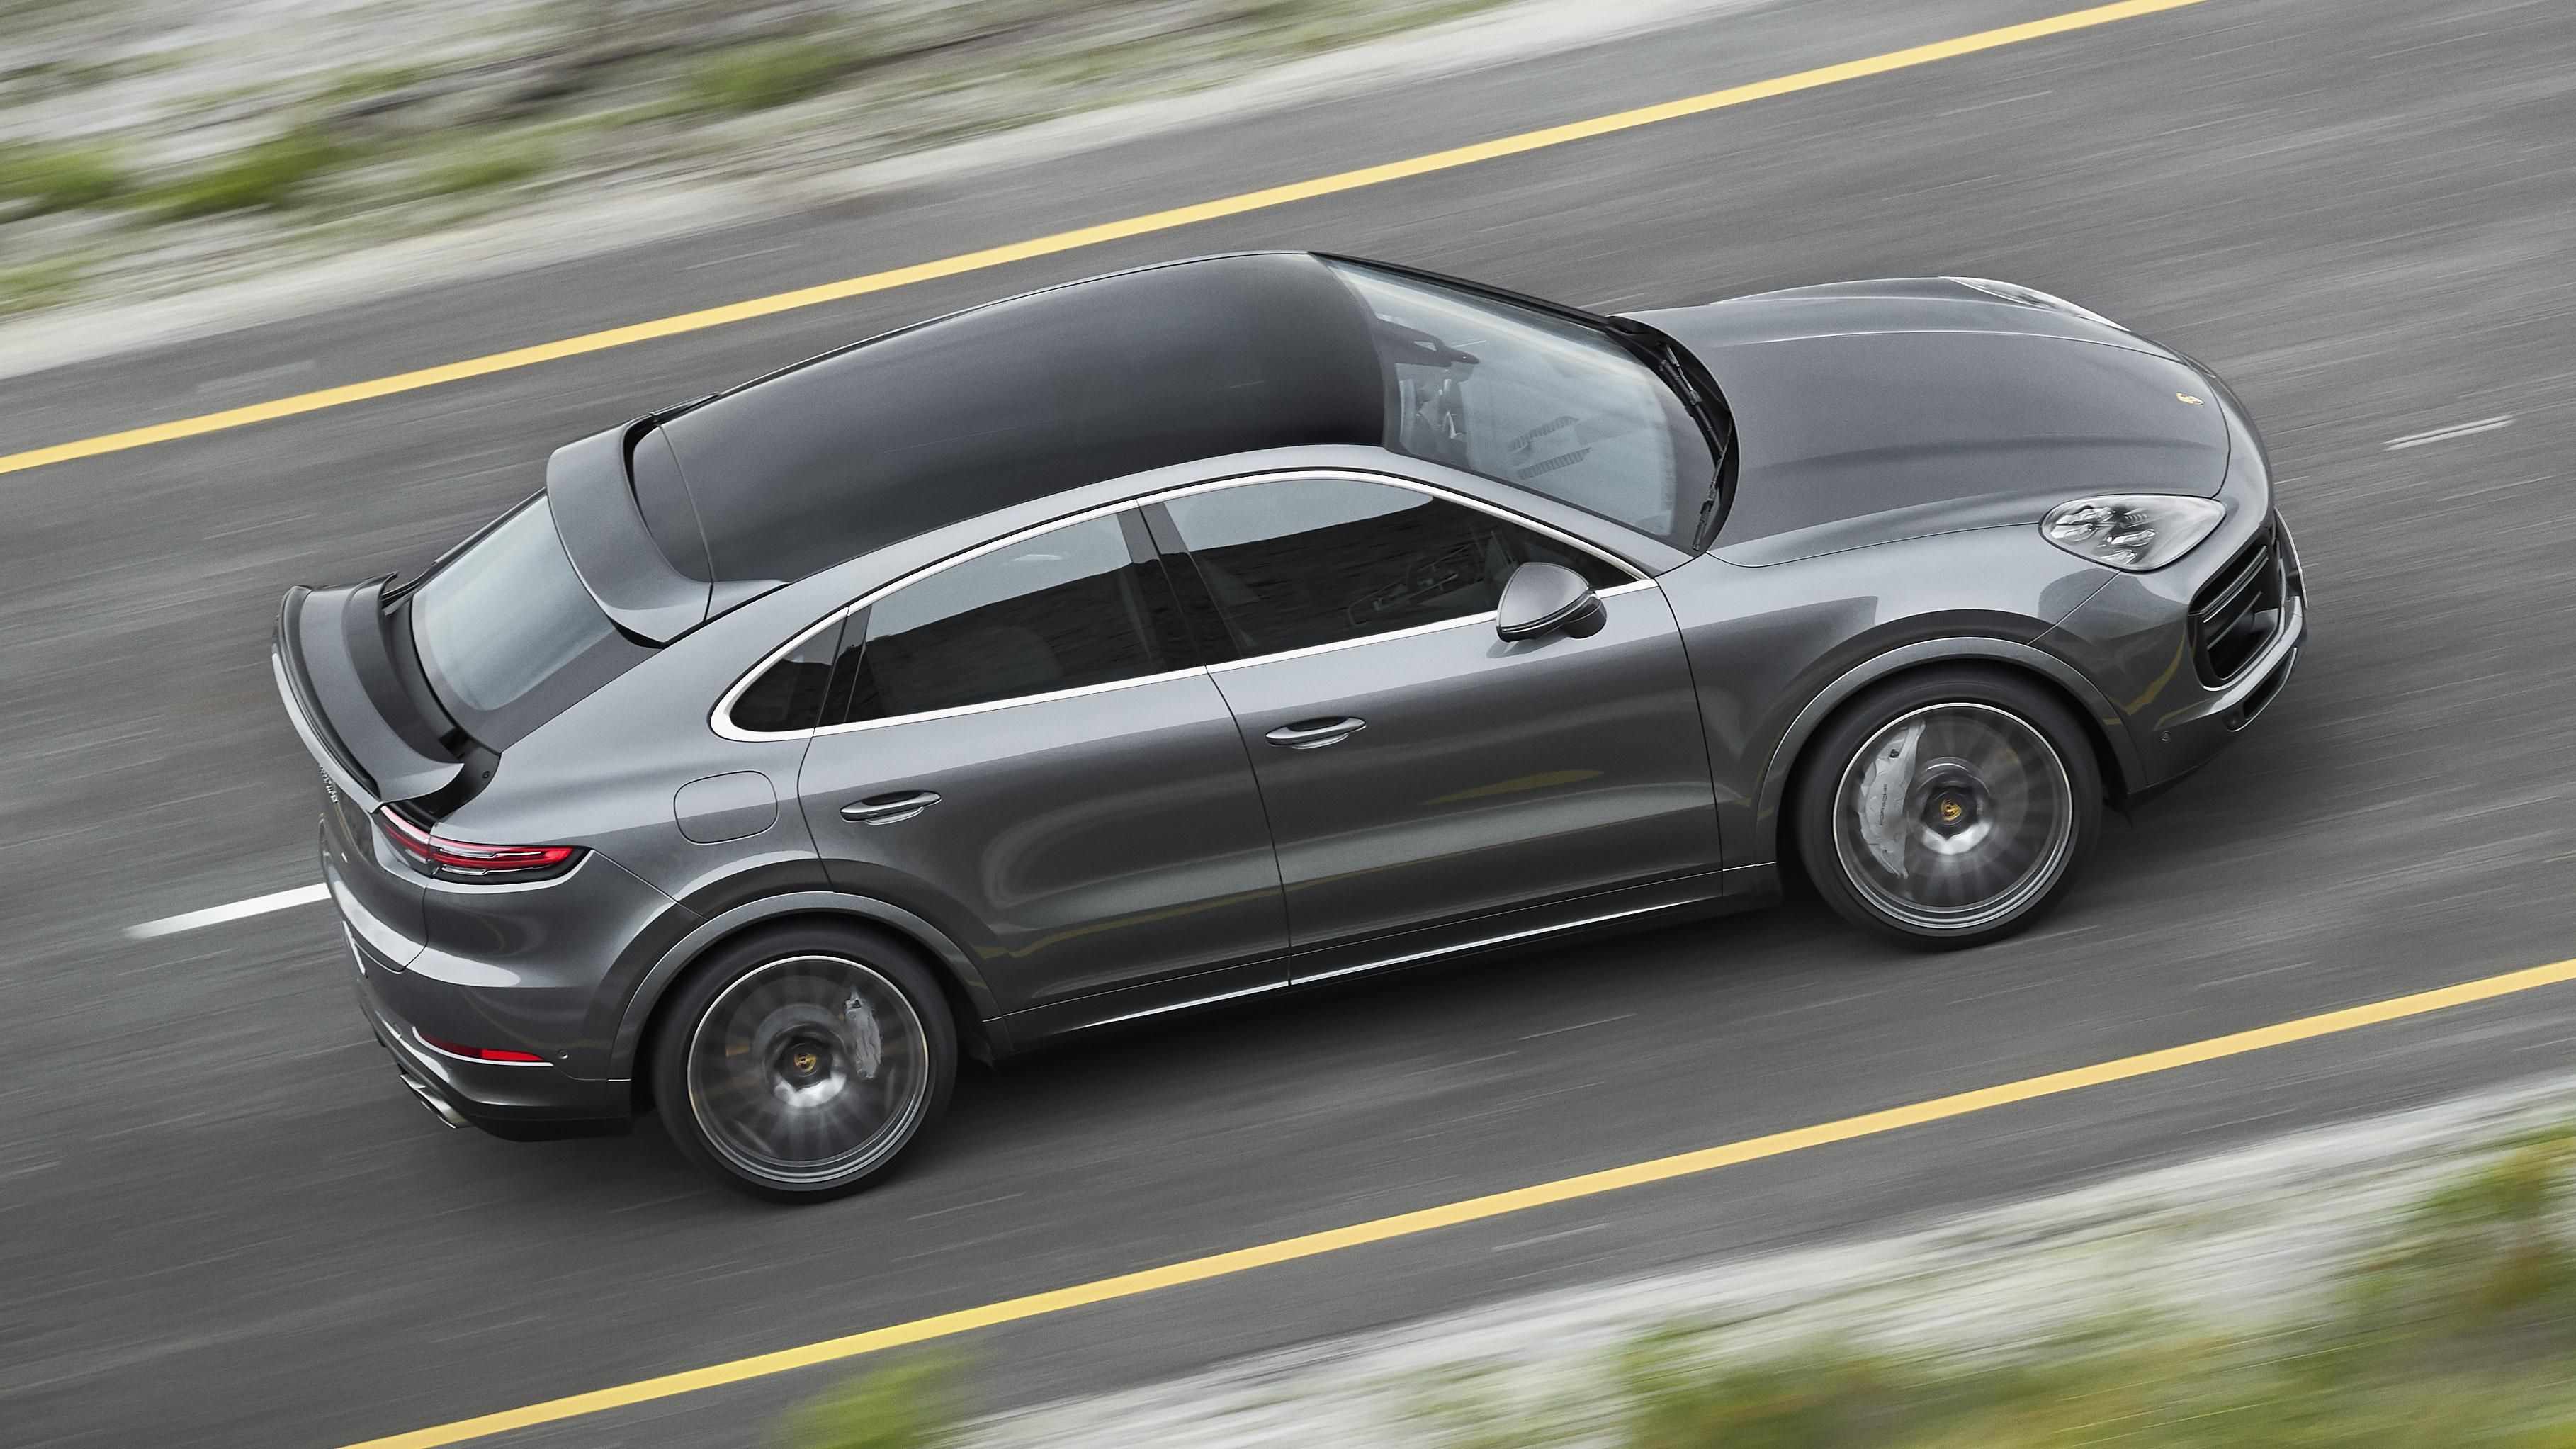 News Porsche Reveals Cayenne Coupe To Battle Bmw X6